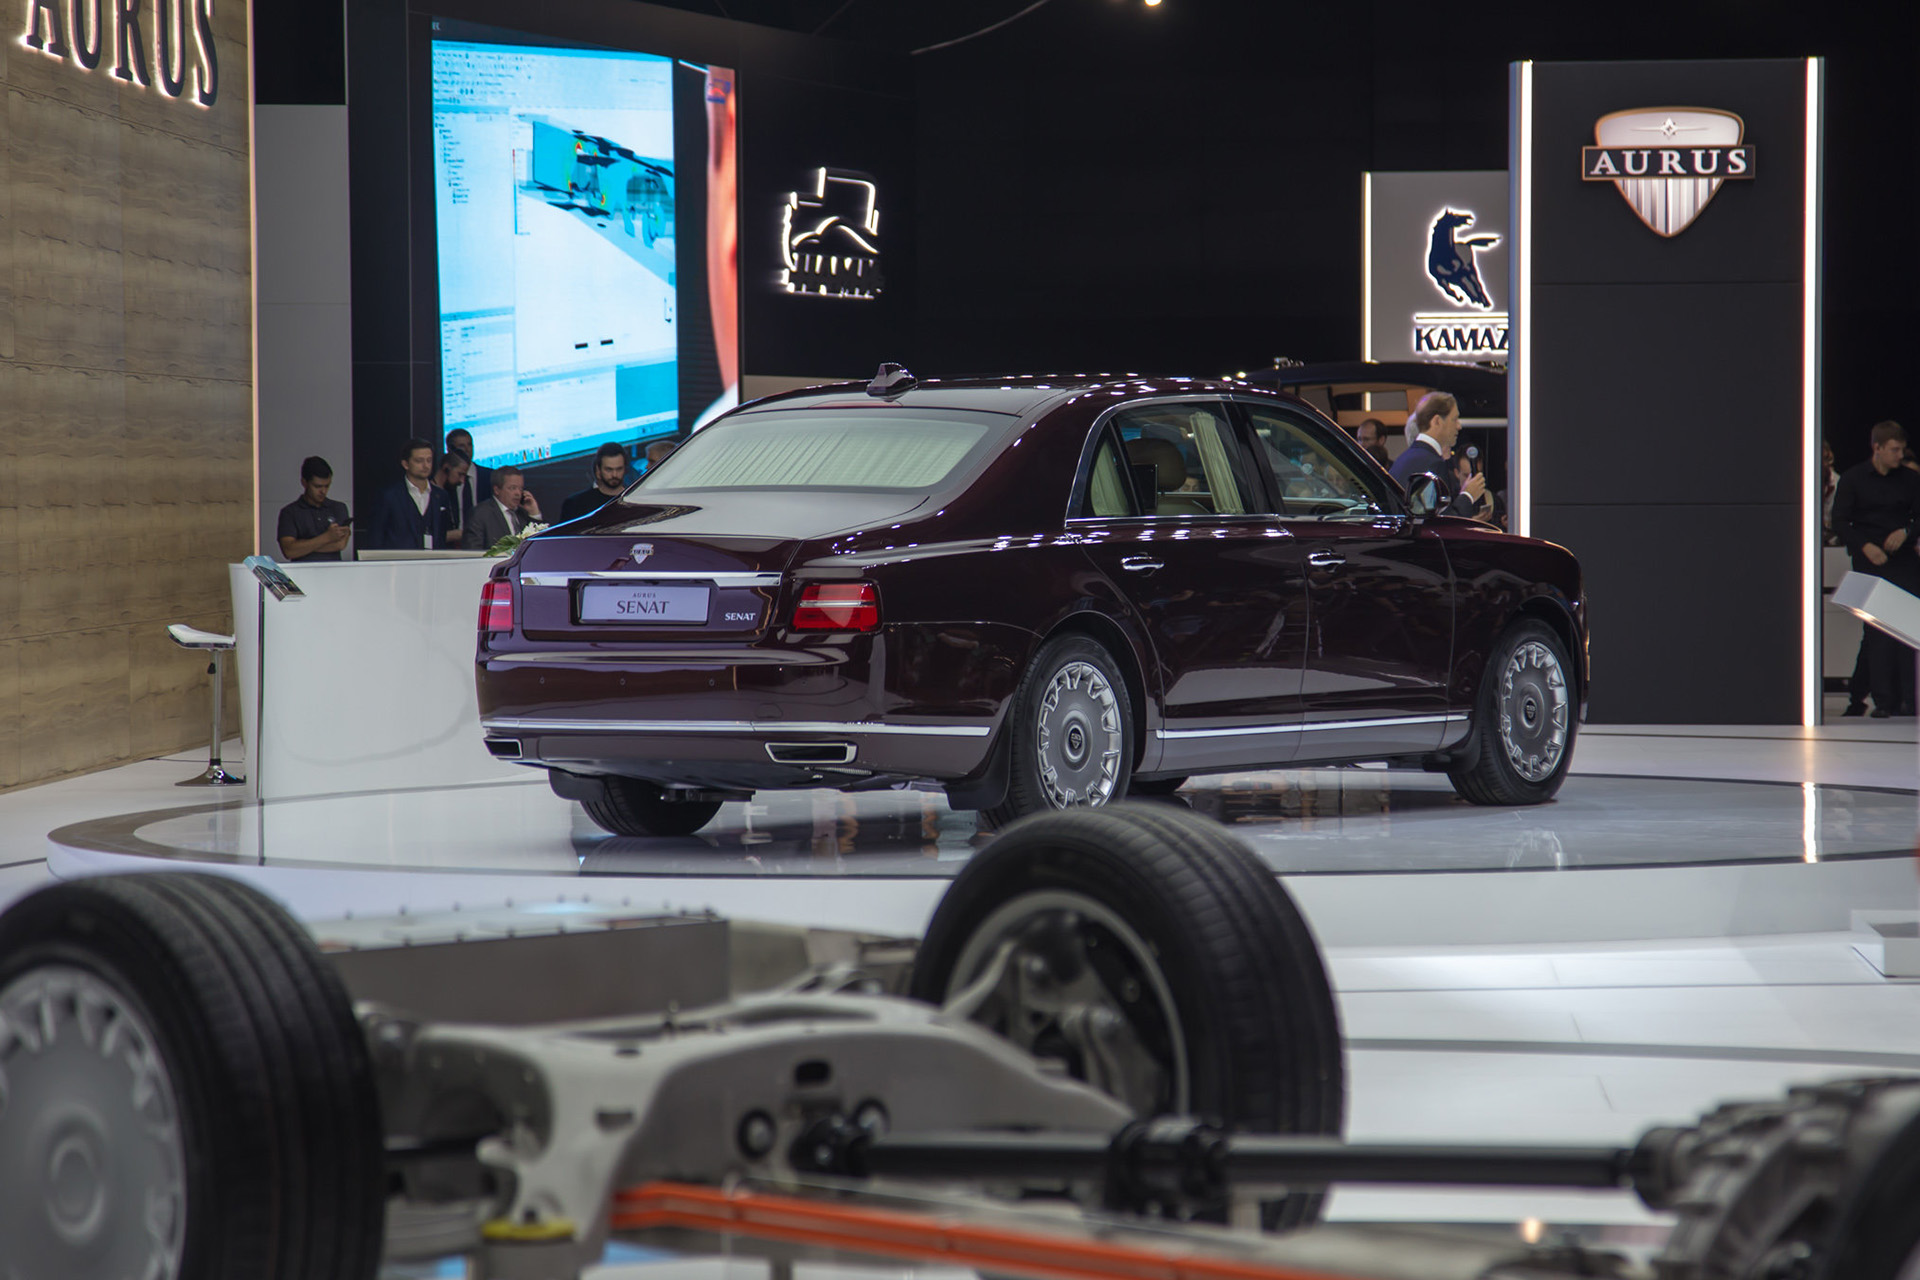 Aurus Senat: Vladimir Putin's New Presidential Limousine 4